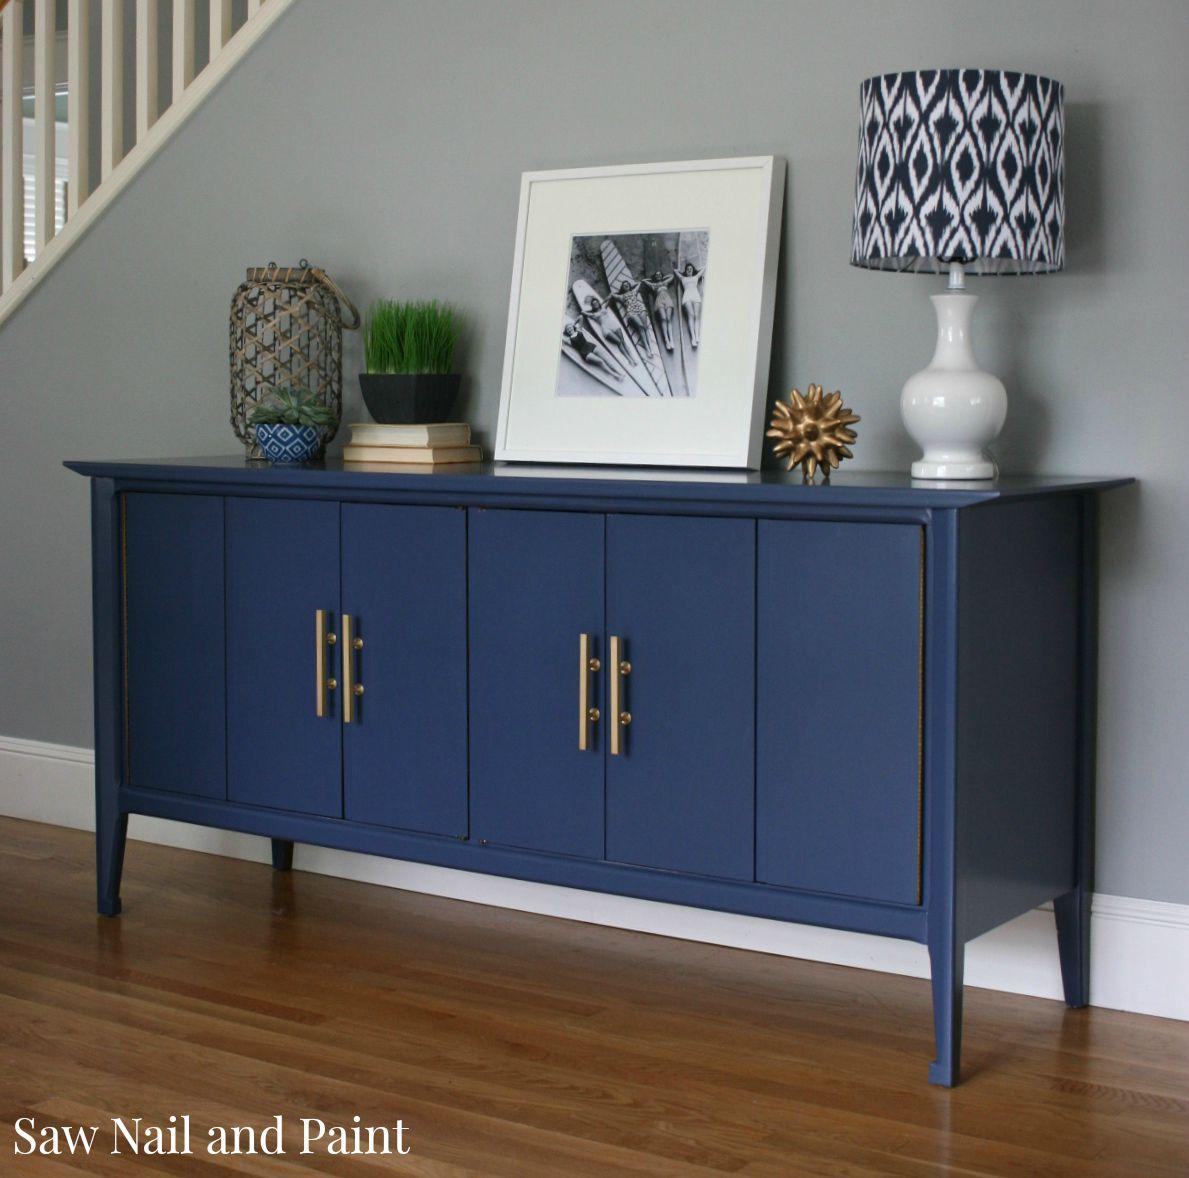 Indigo Blue Mid Century Buffet Saw Nail And Paint